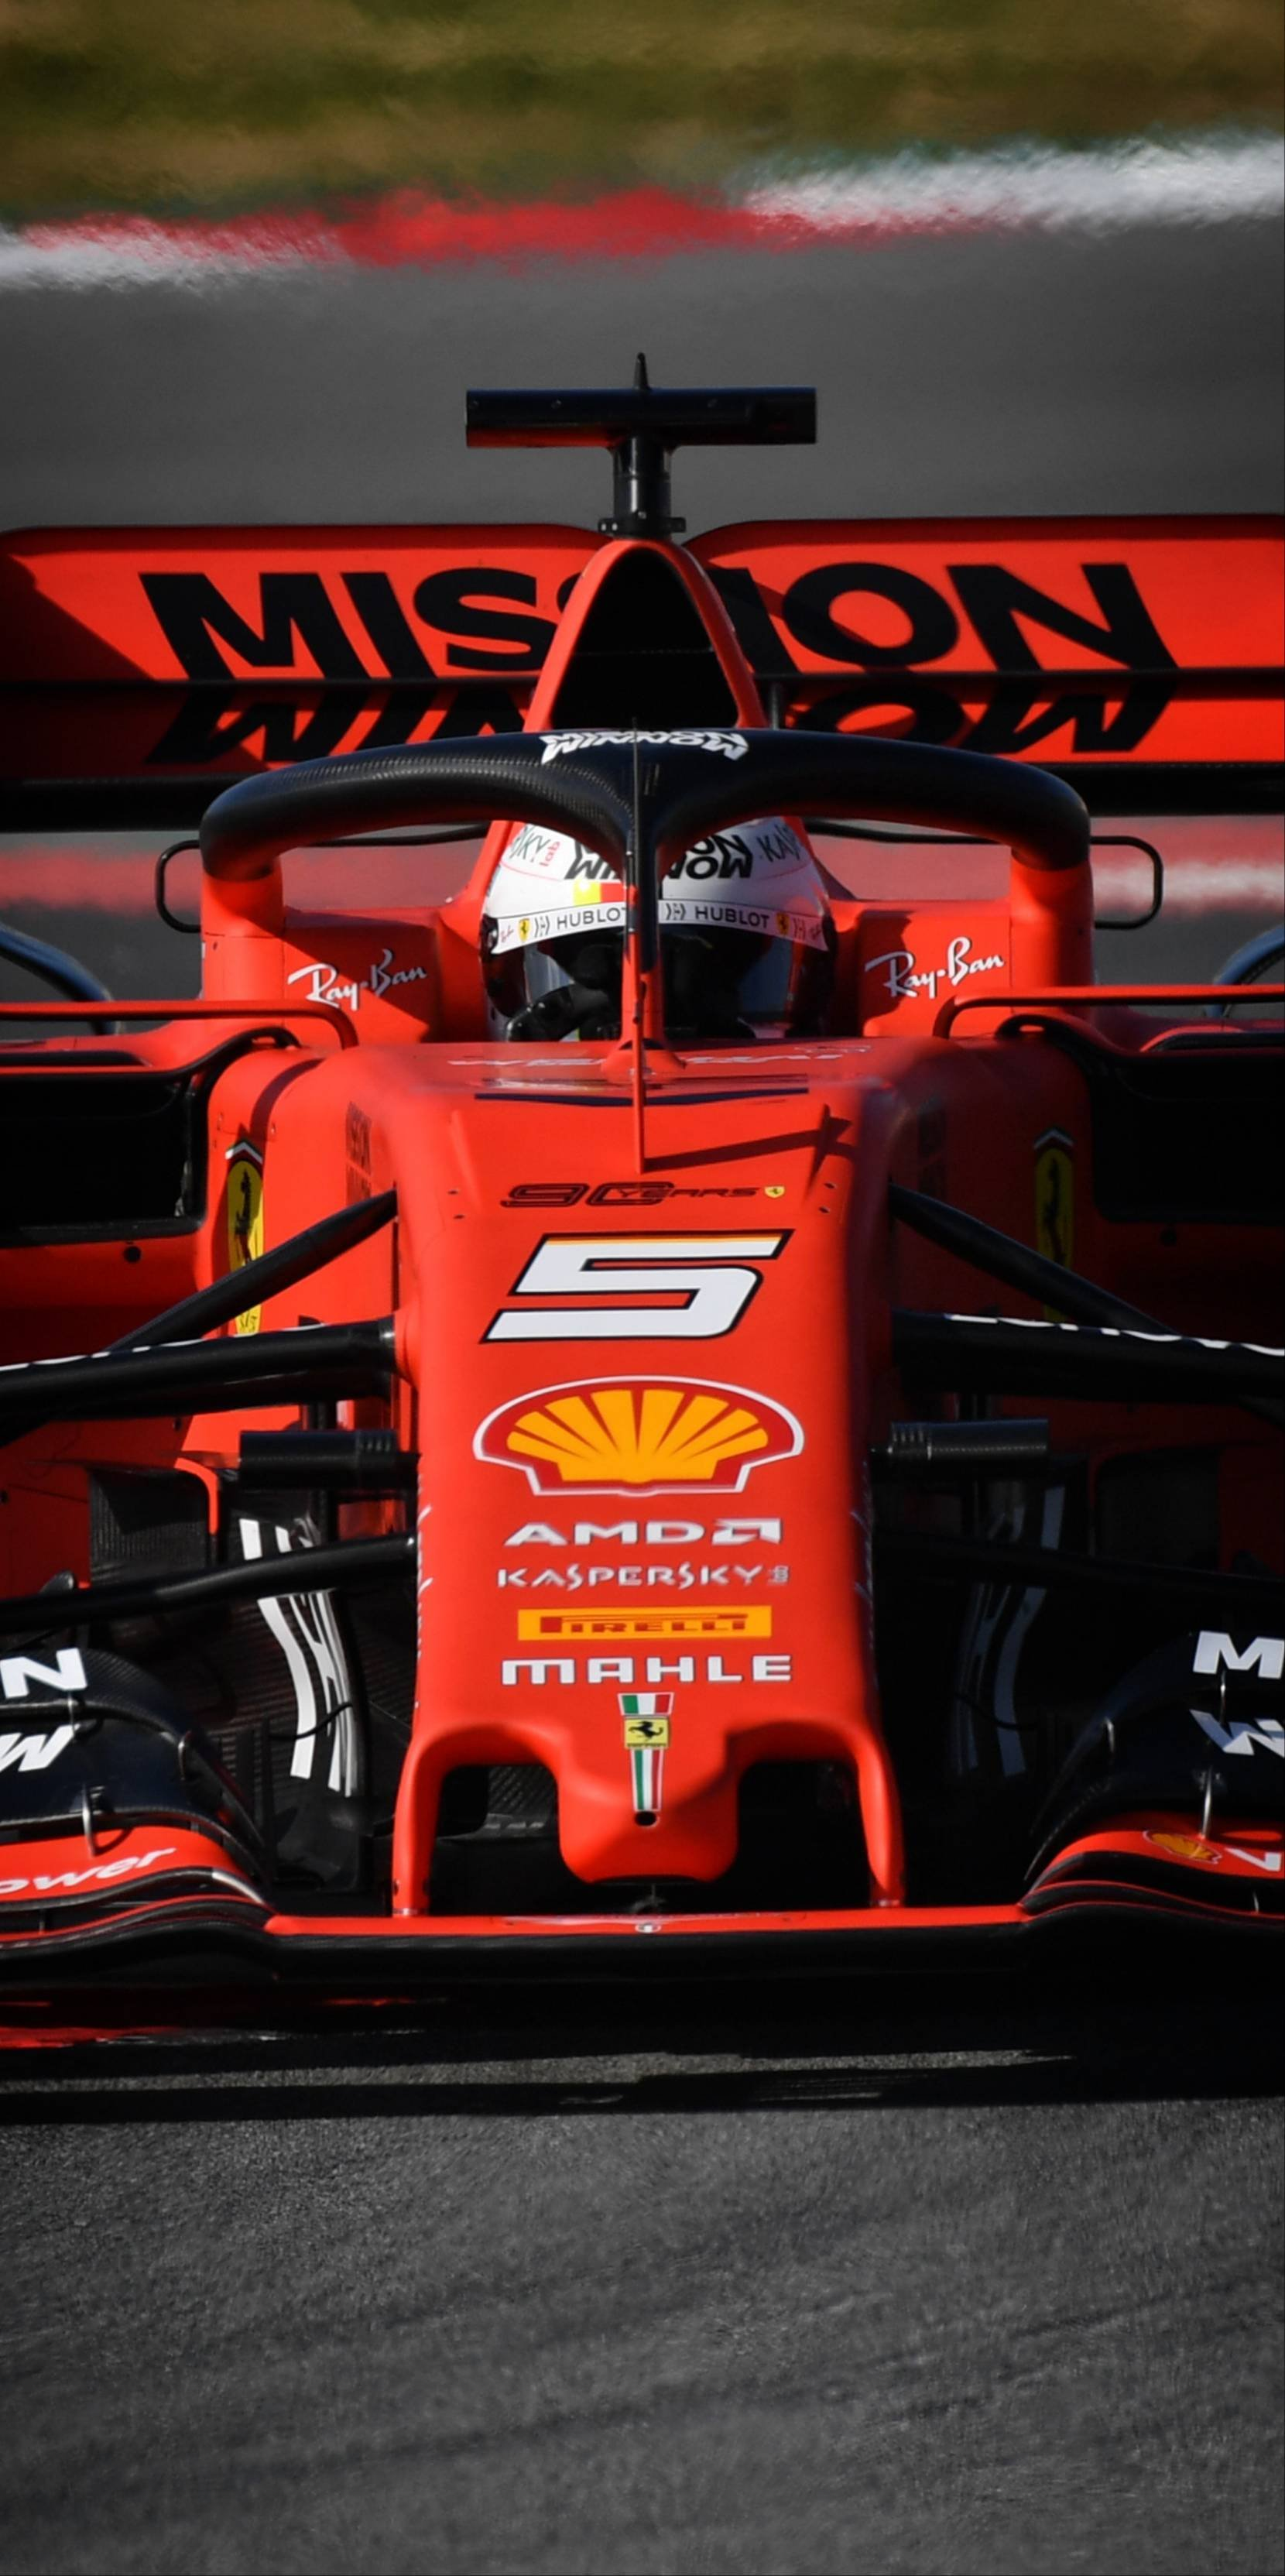 Ferrari F1 Wallpaper Posted By Sarah Mercado